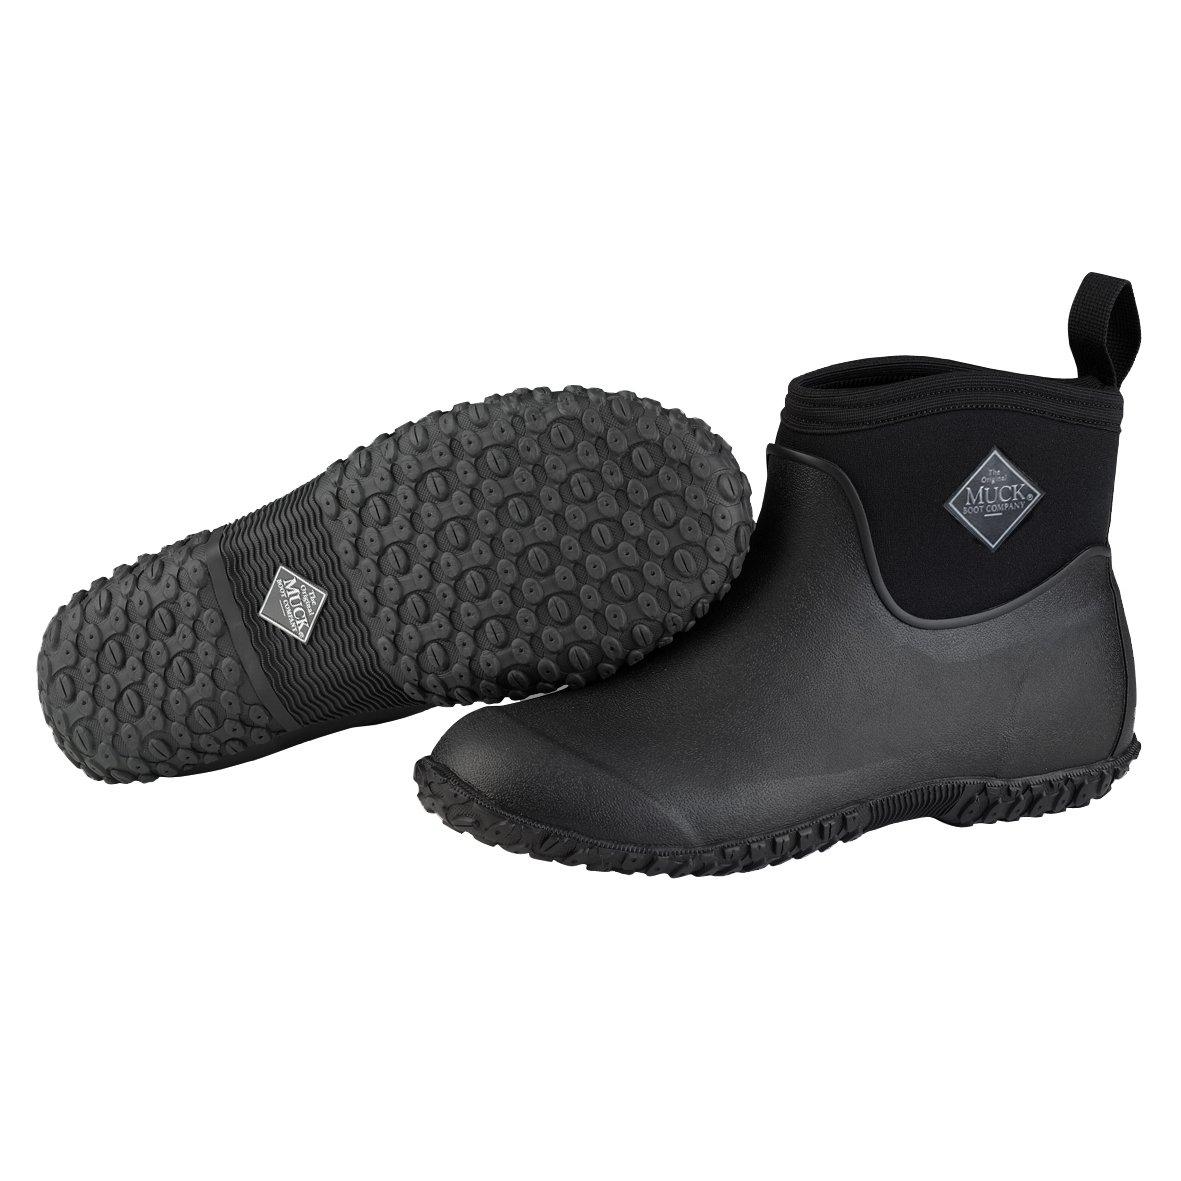 Muck Boot Women's Muckster 2 Ankle Snow Boot B01A7RR6FM 9 B(M) US|Black